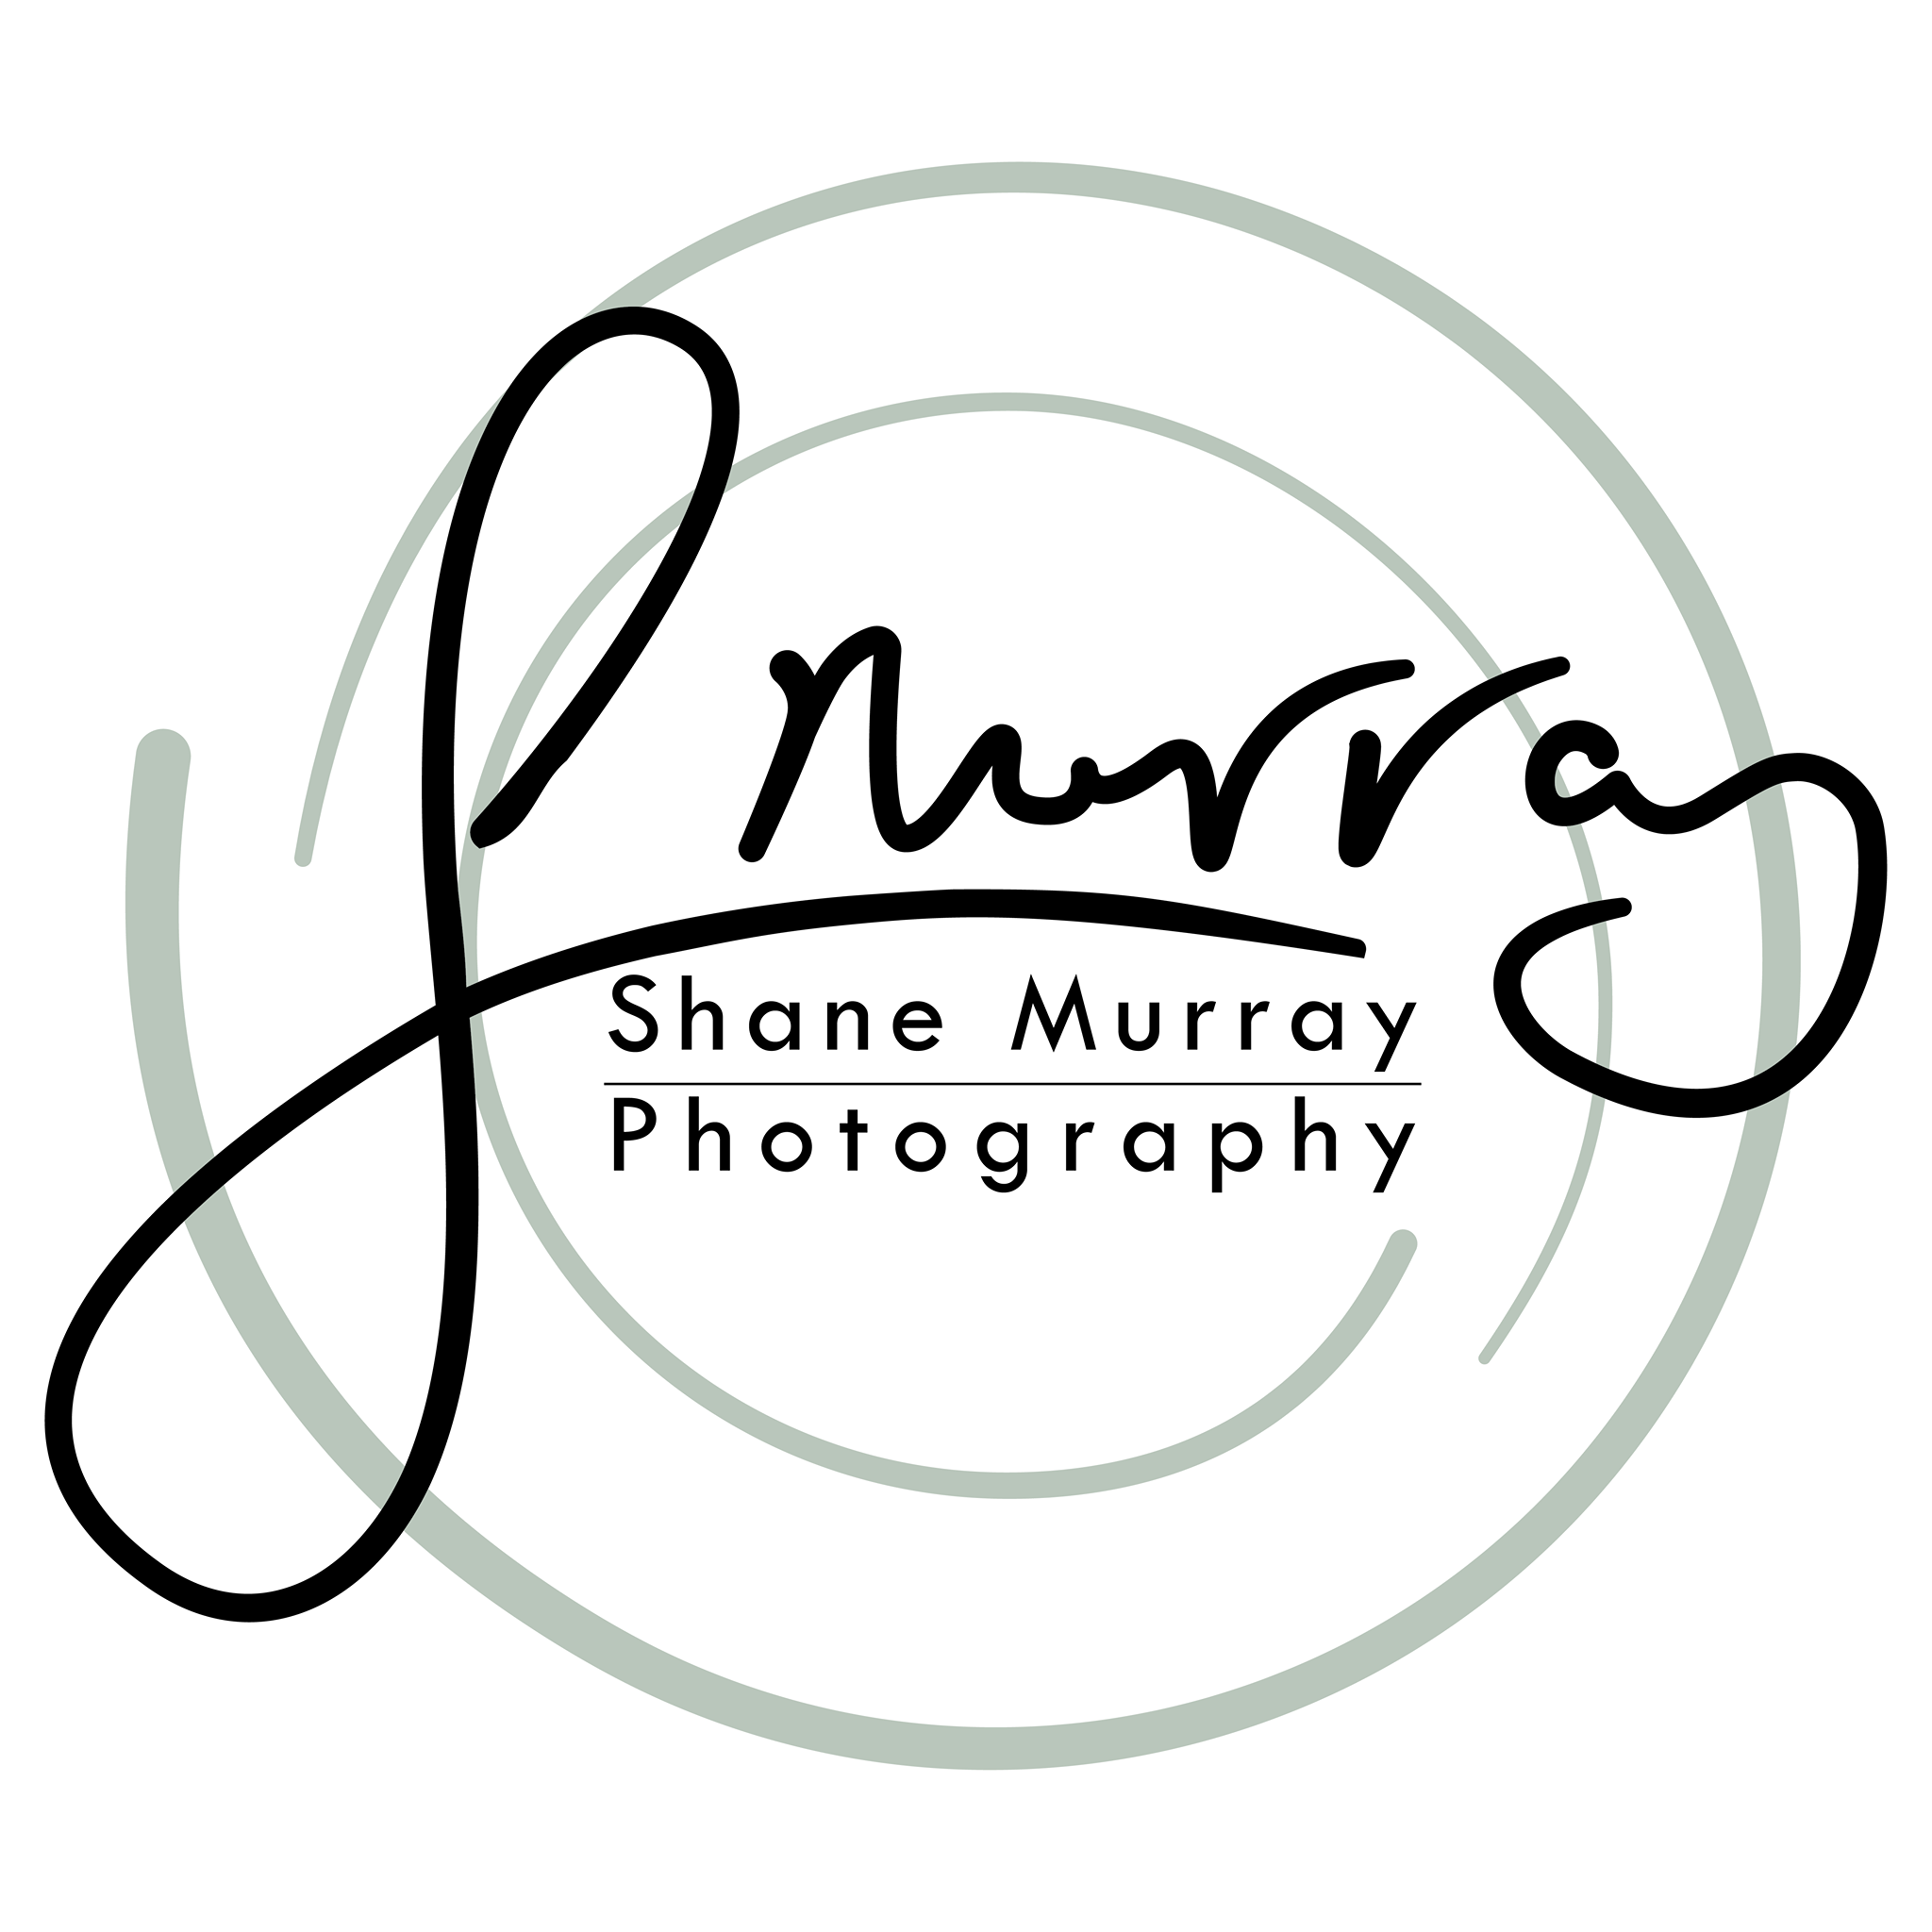 Shane Murray